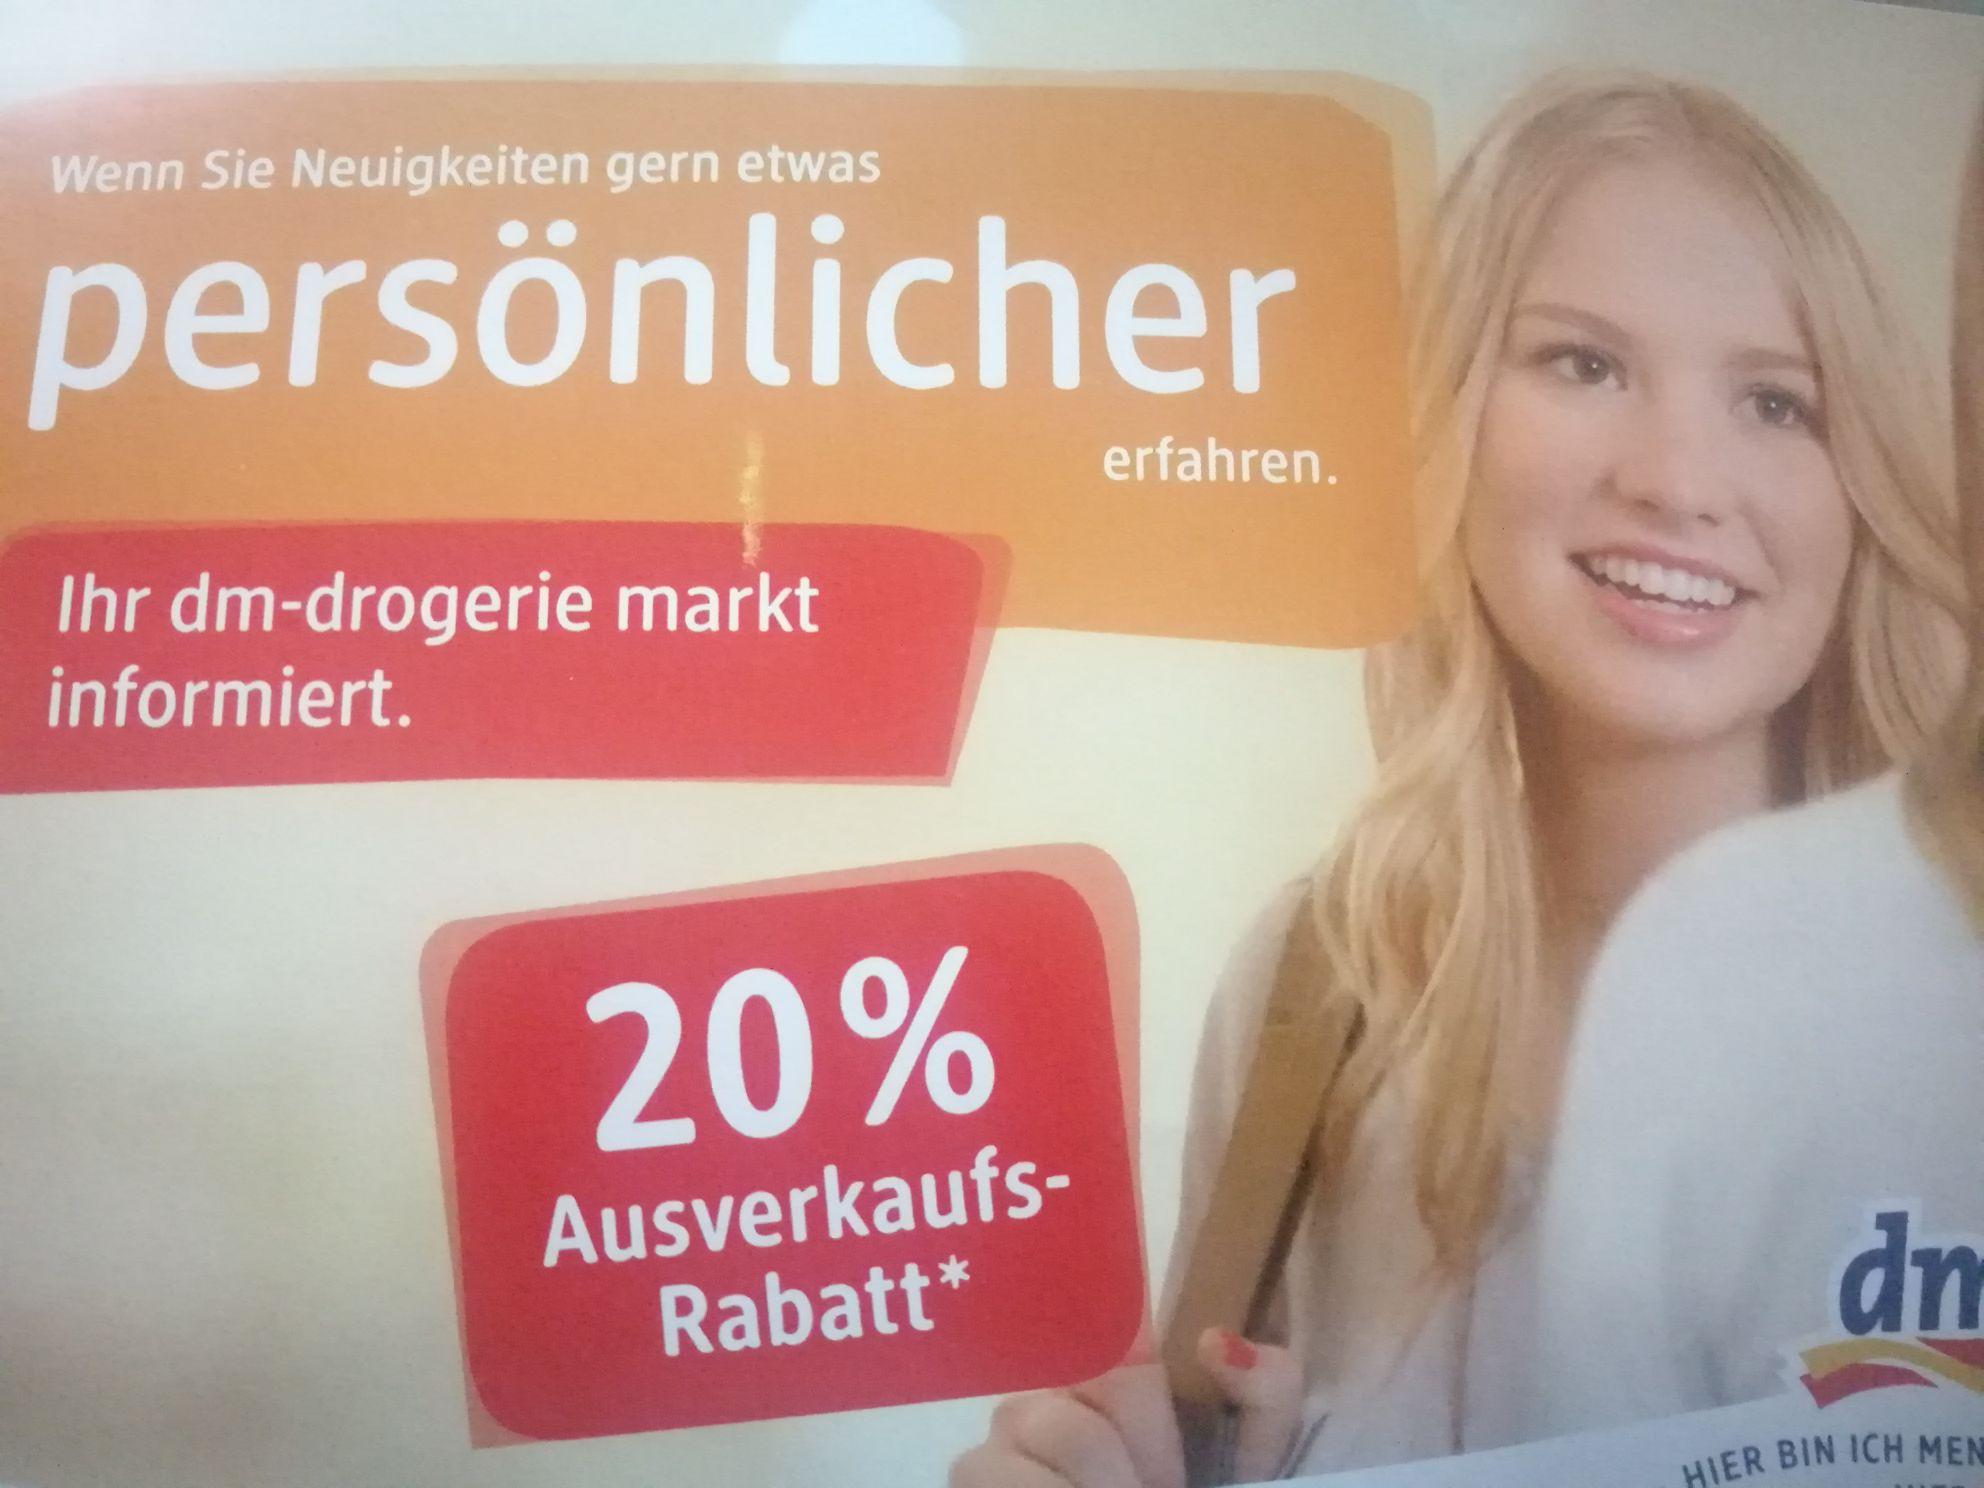 [Lokal Berlin] DM Müllerstraße 40 b (Wedding) ab 21.2. 20% Rabatt auf alle Produkte